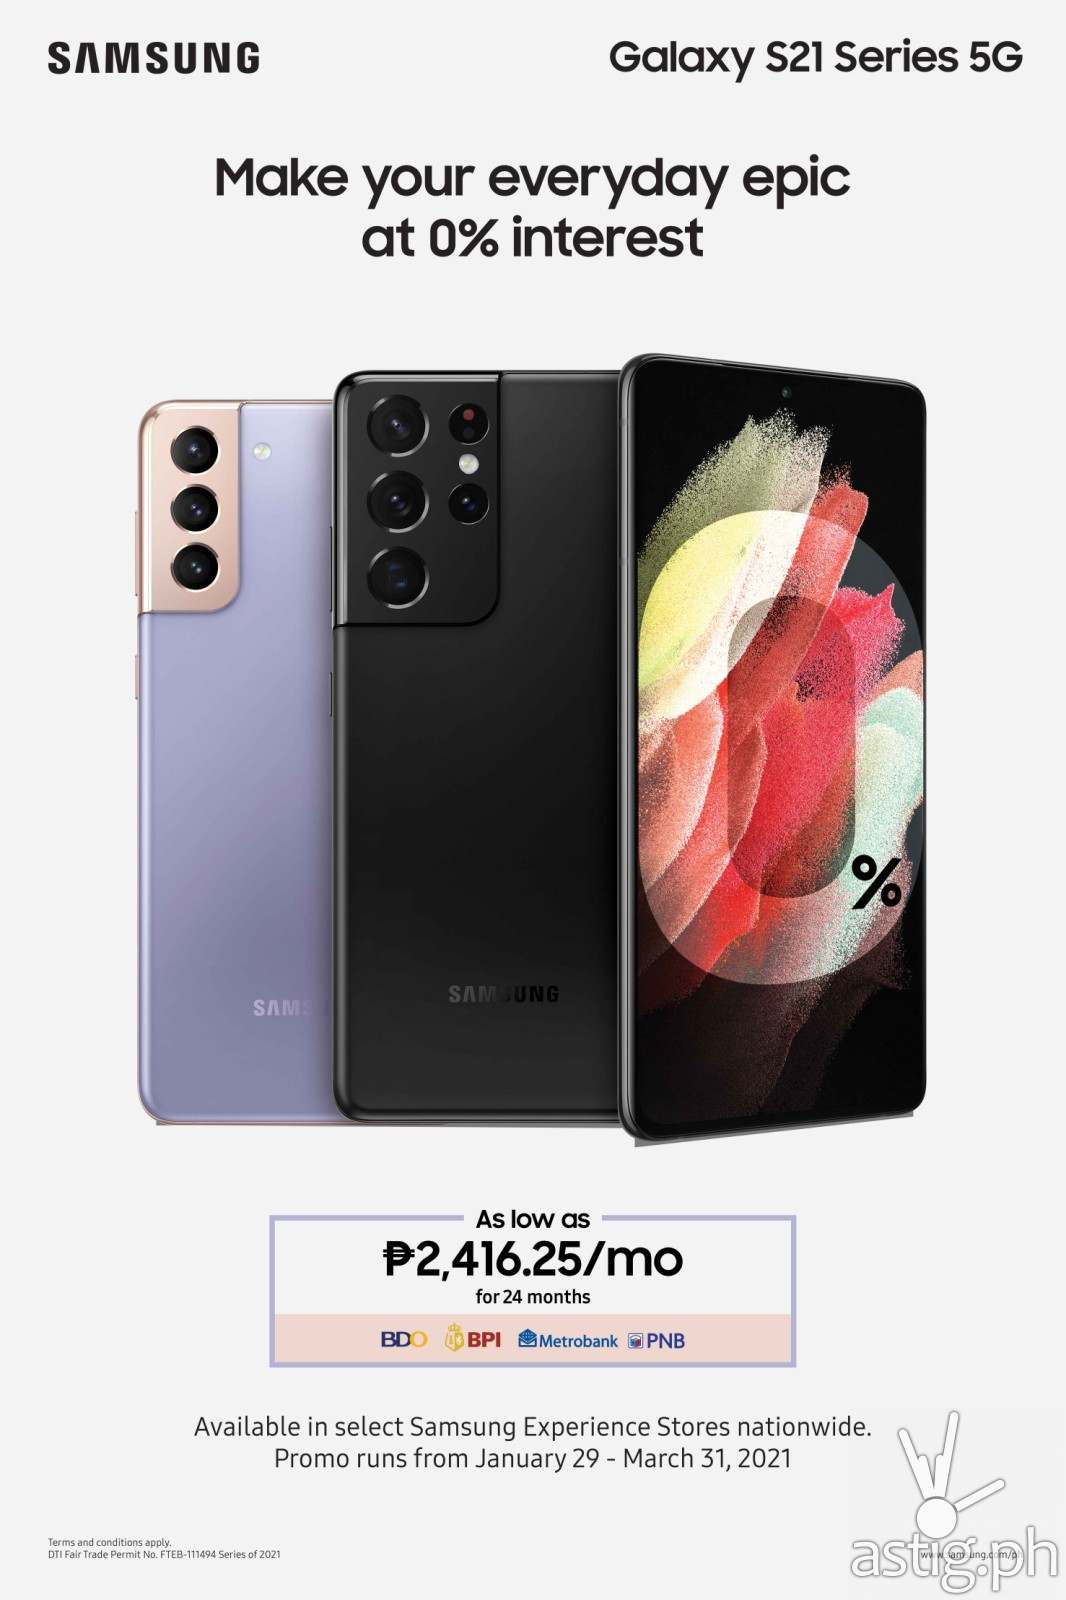 SAMSUNG Galaxy S21 Series 5G promo (Philippines)